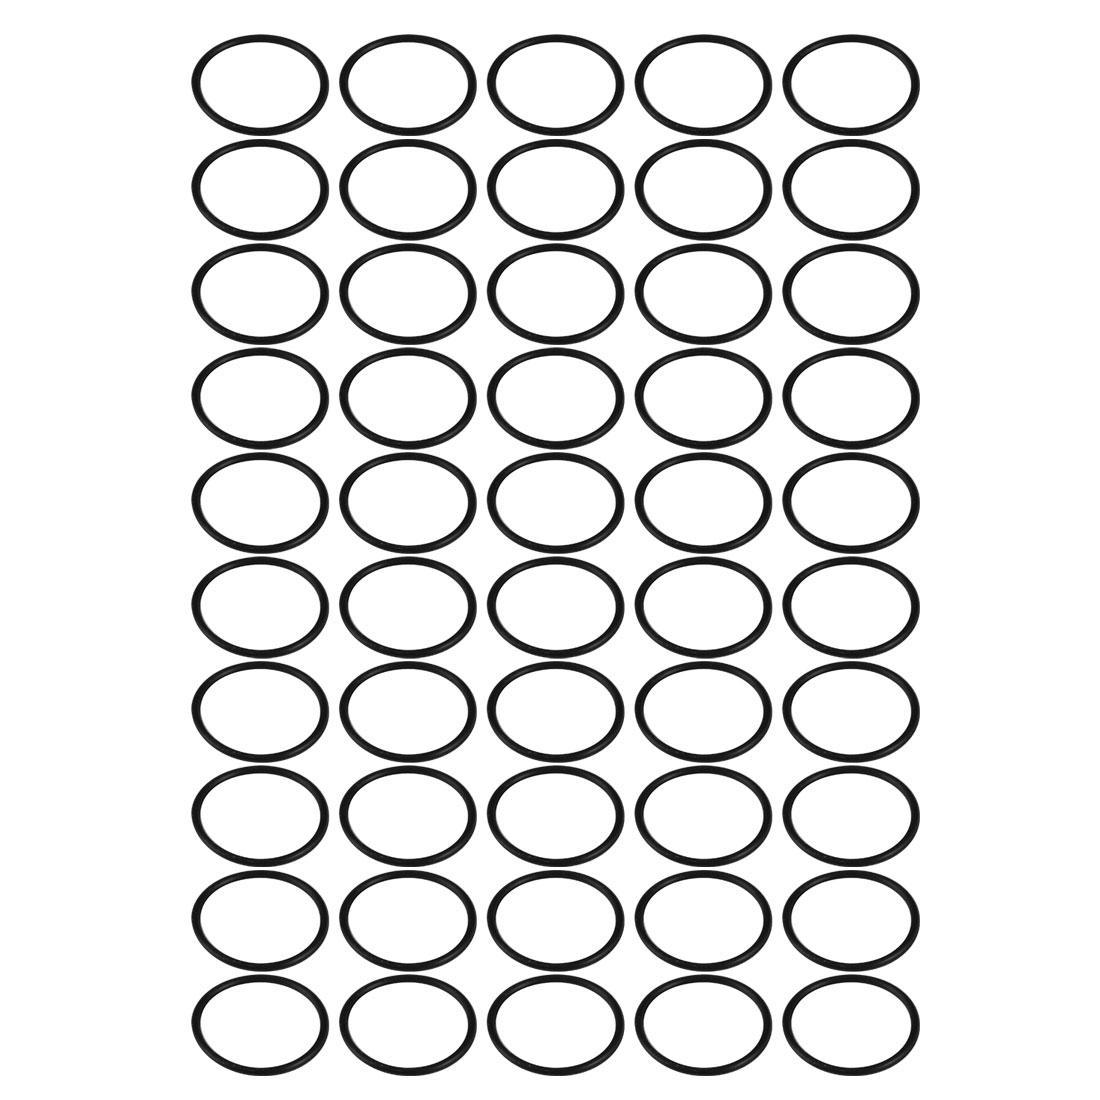 50pcs 23mm x 1.5mm Mechanical Rubber O Ring Oil Seal Black